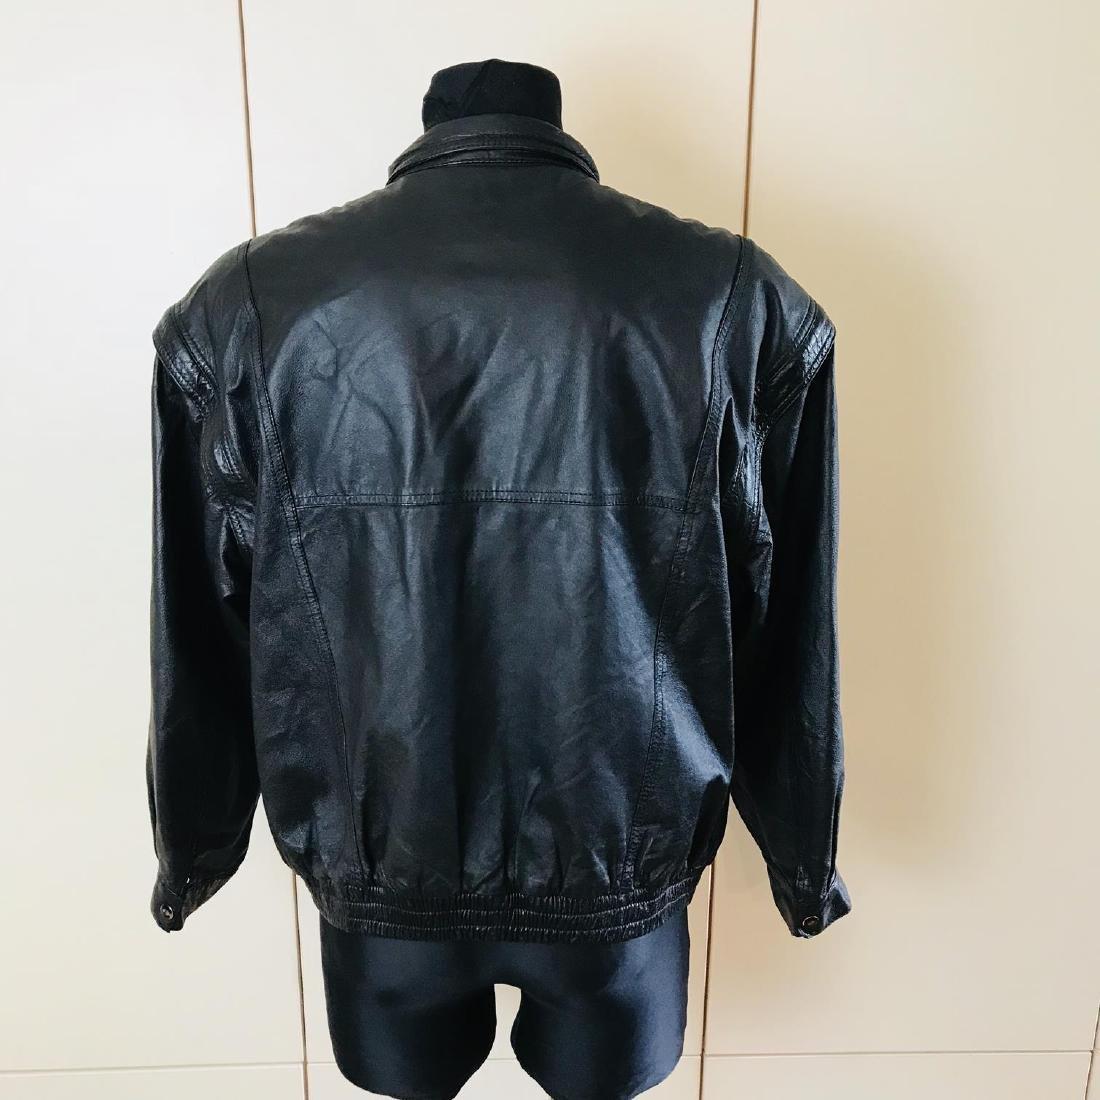 Vintage Men's Boecker Leather Jacket Size US 42 - 5